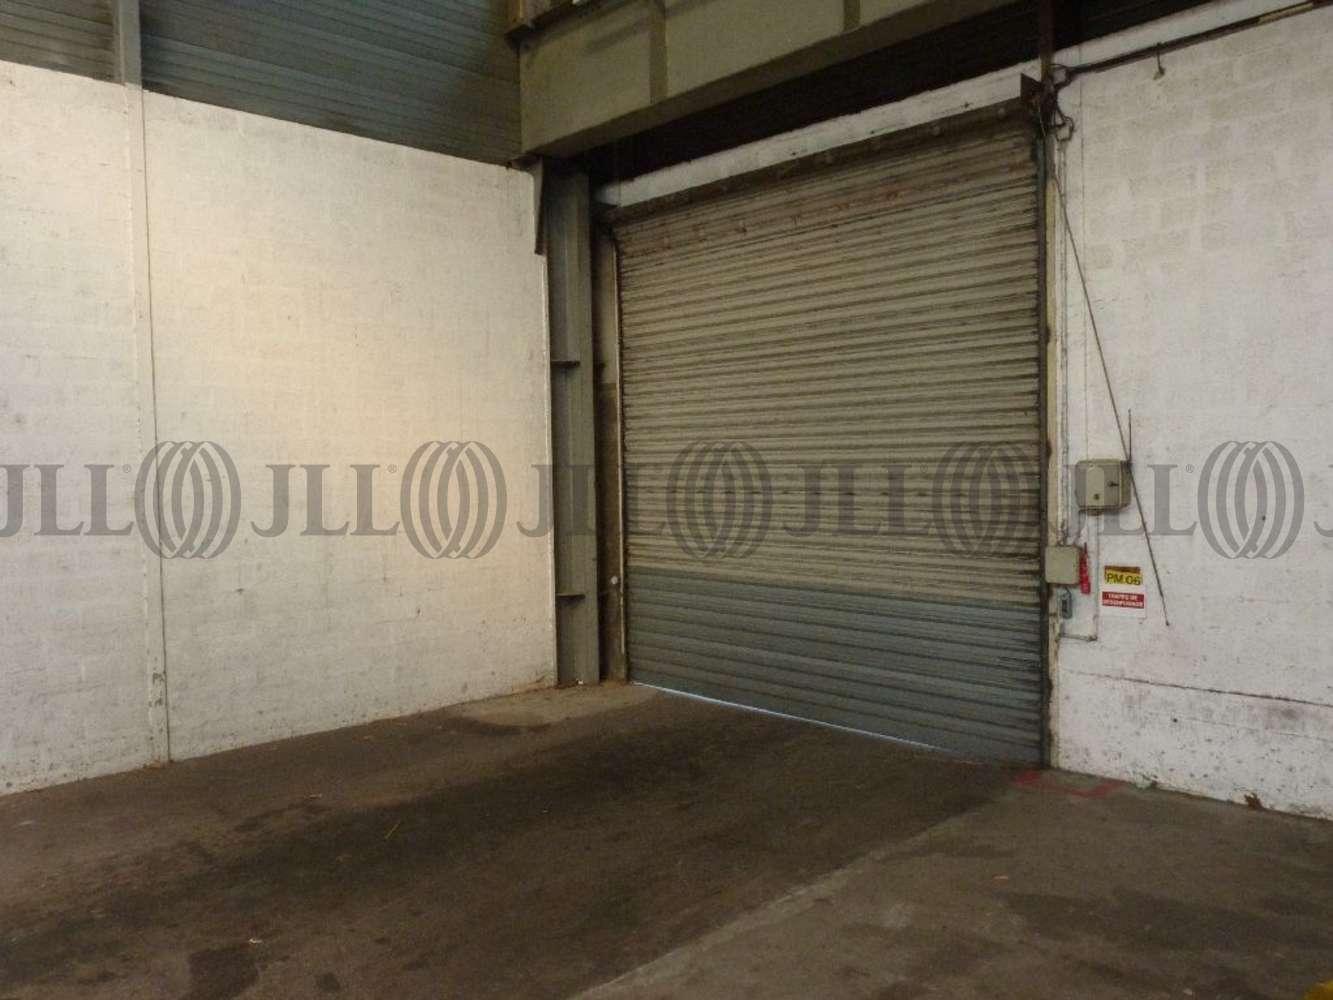 Activités/entrepôt Meyzieu, 69330 - 12 RUE JEAN JAURES - 10885722